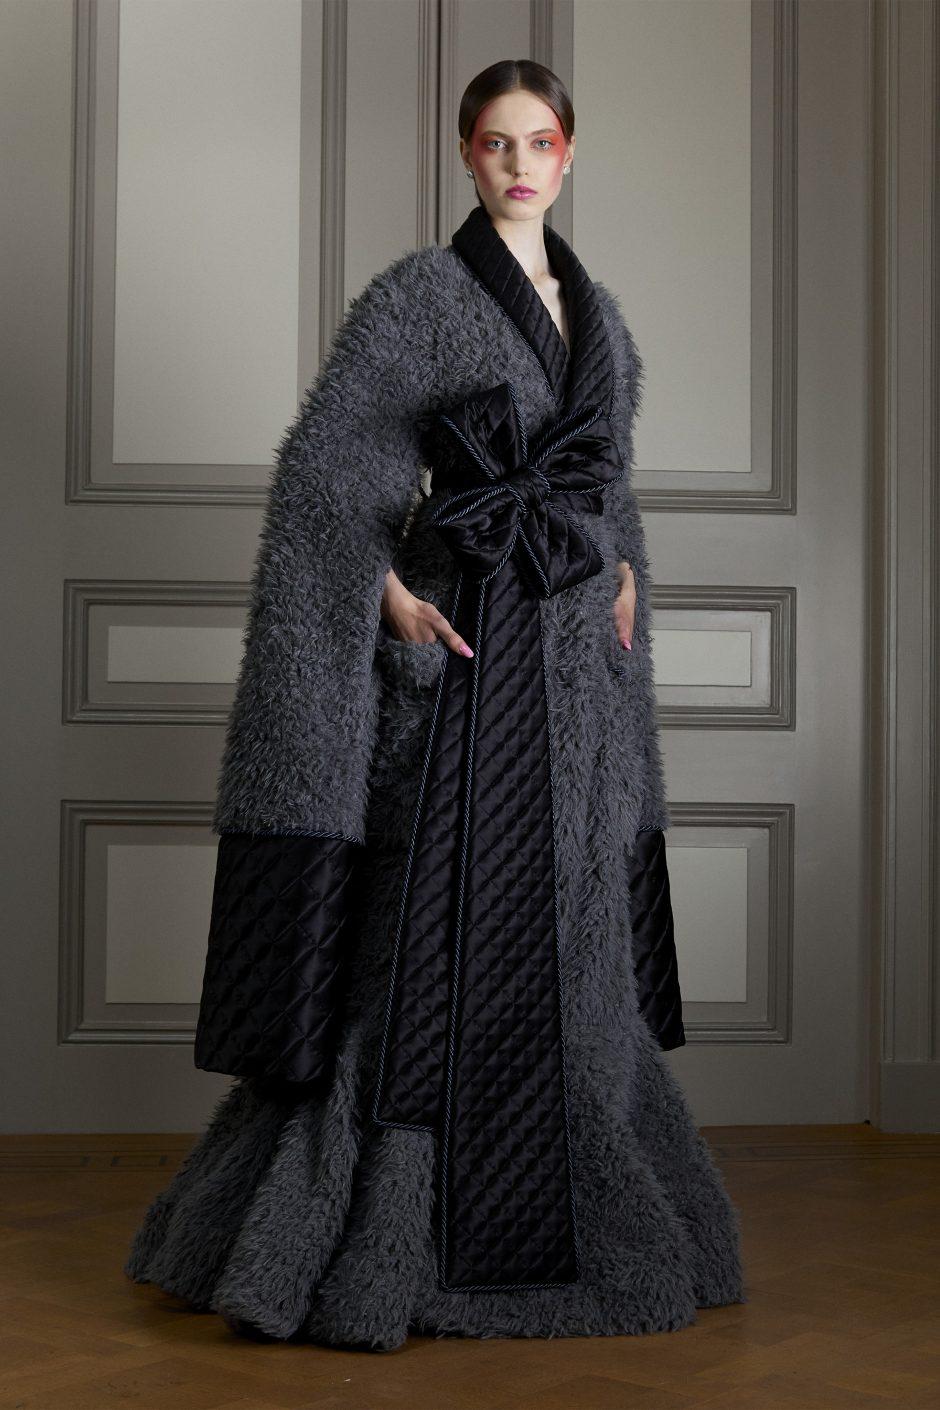 00002-Viktor-Rolf-Couture-FALL-20-Credit-Casper-Kofi